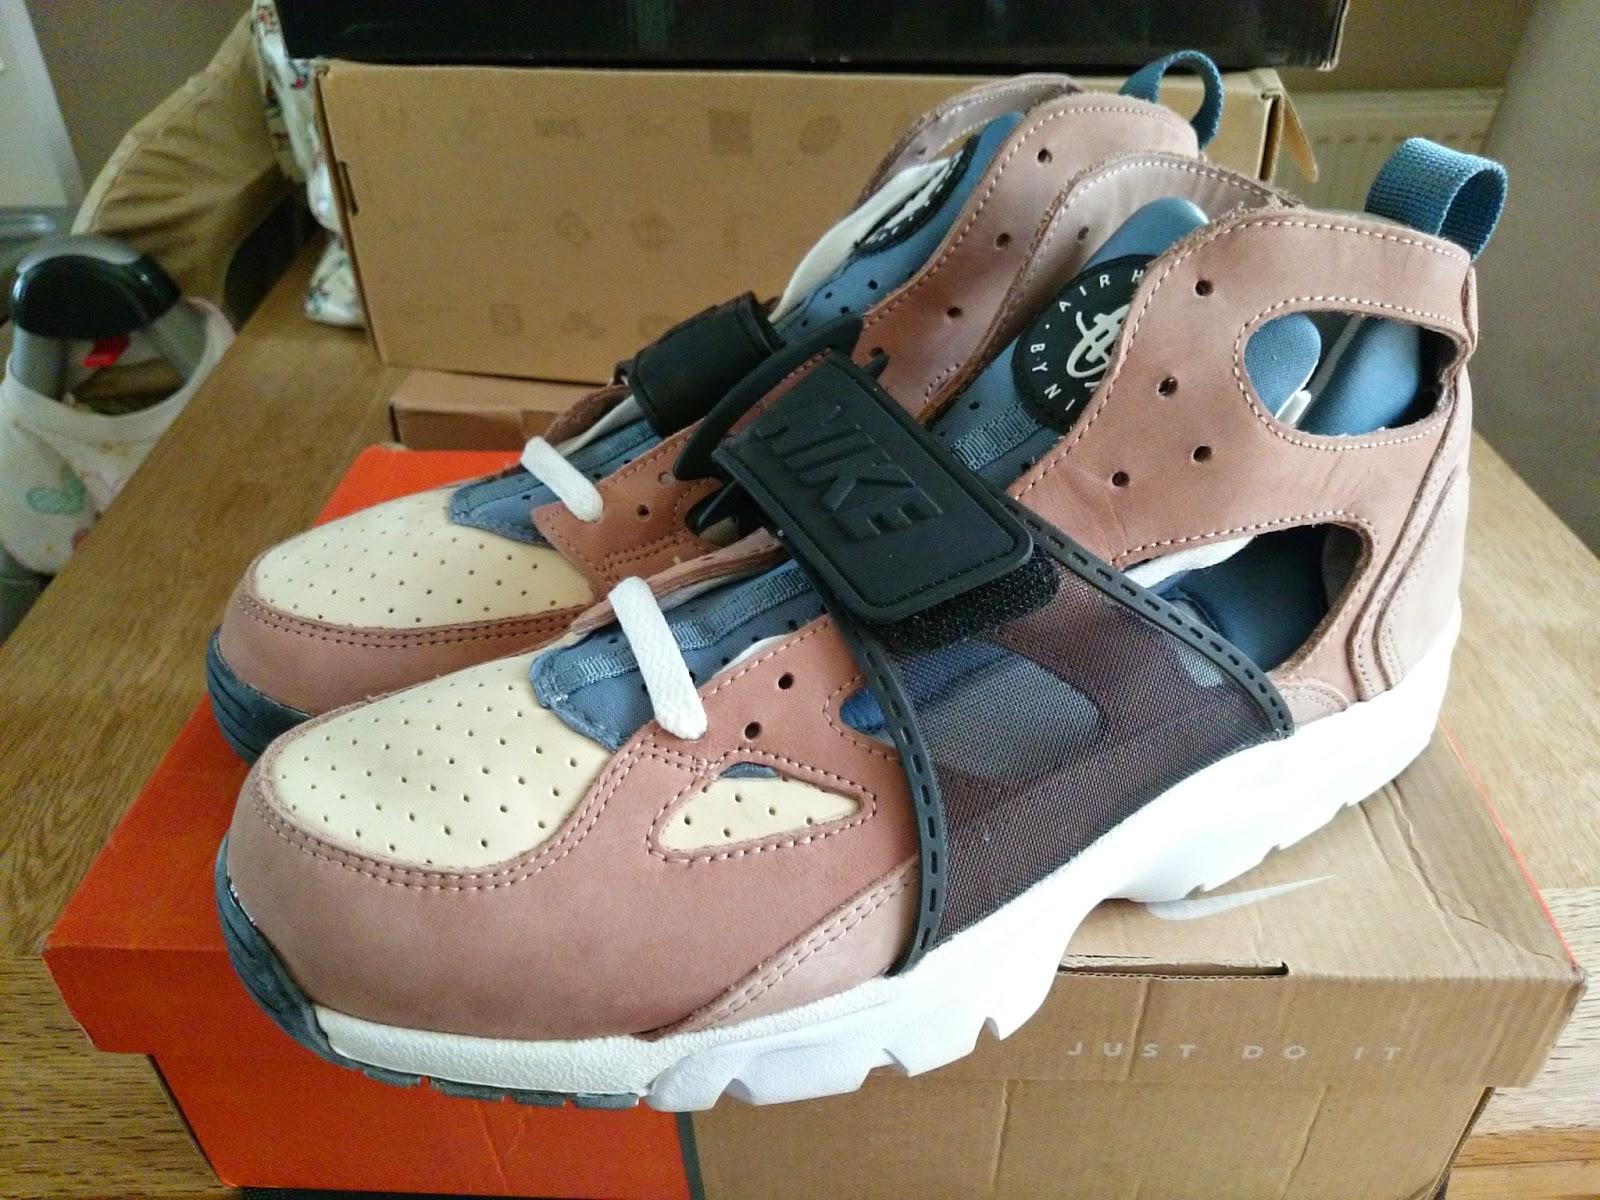 separation shoes edfb0 72278 ... escape Nike Air Huarache Trainer .